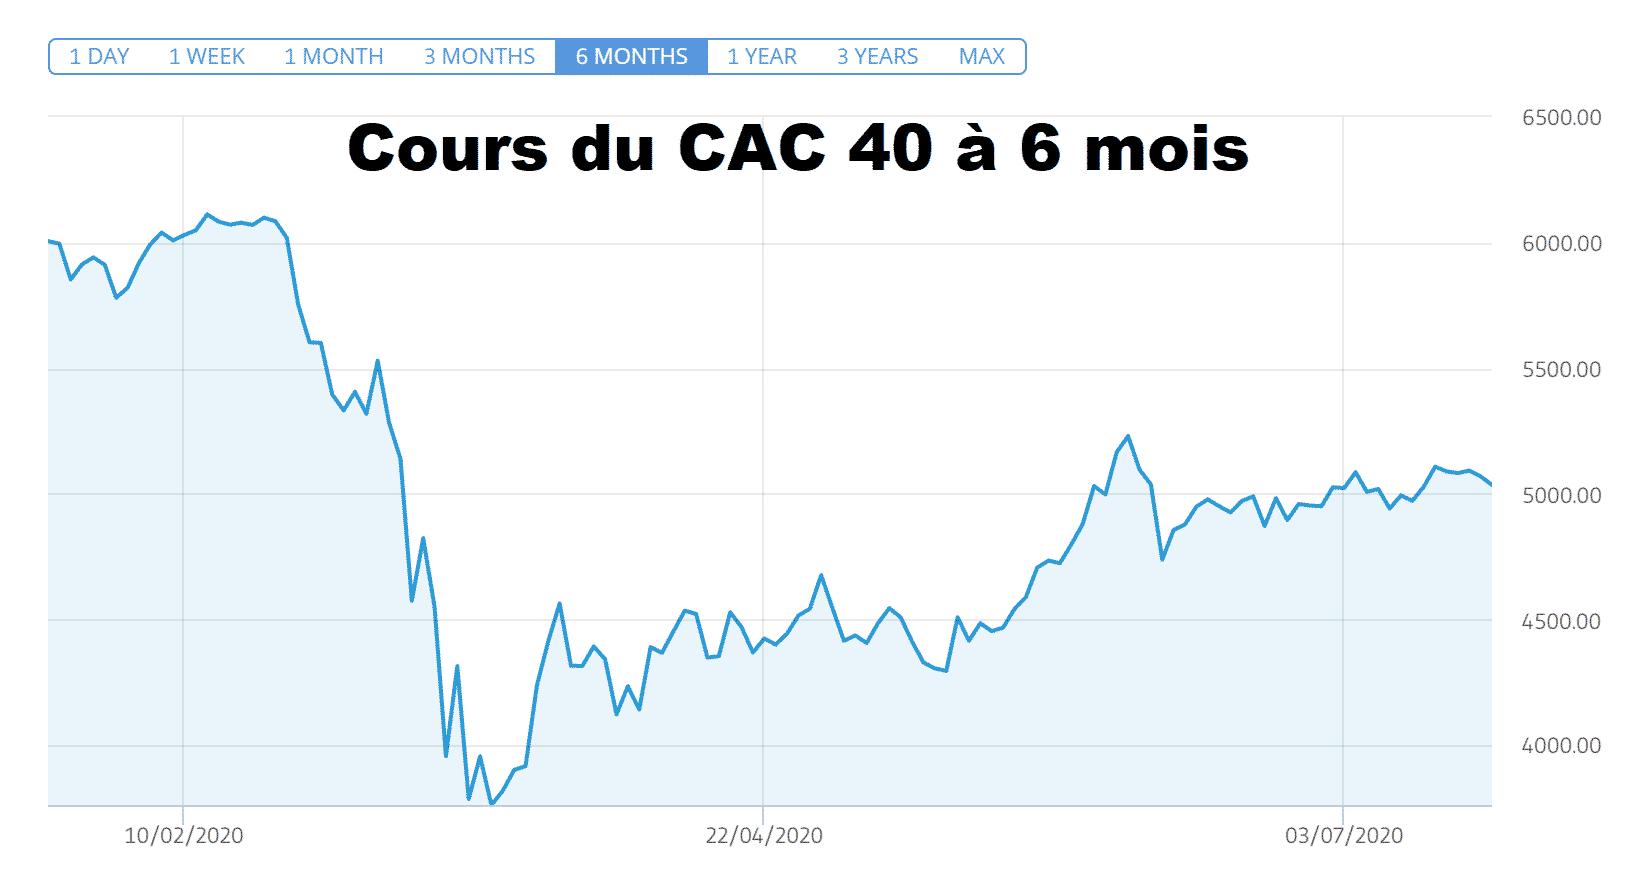 Veolia STMicroelectronics tirent CAC 40 Bourse Paris